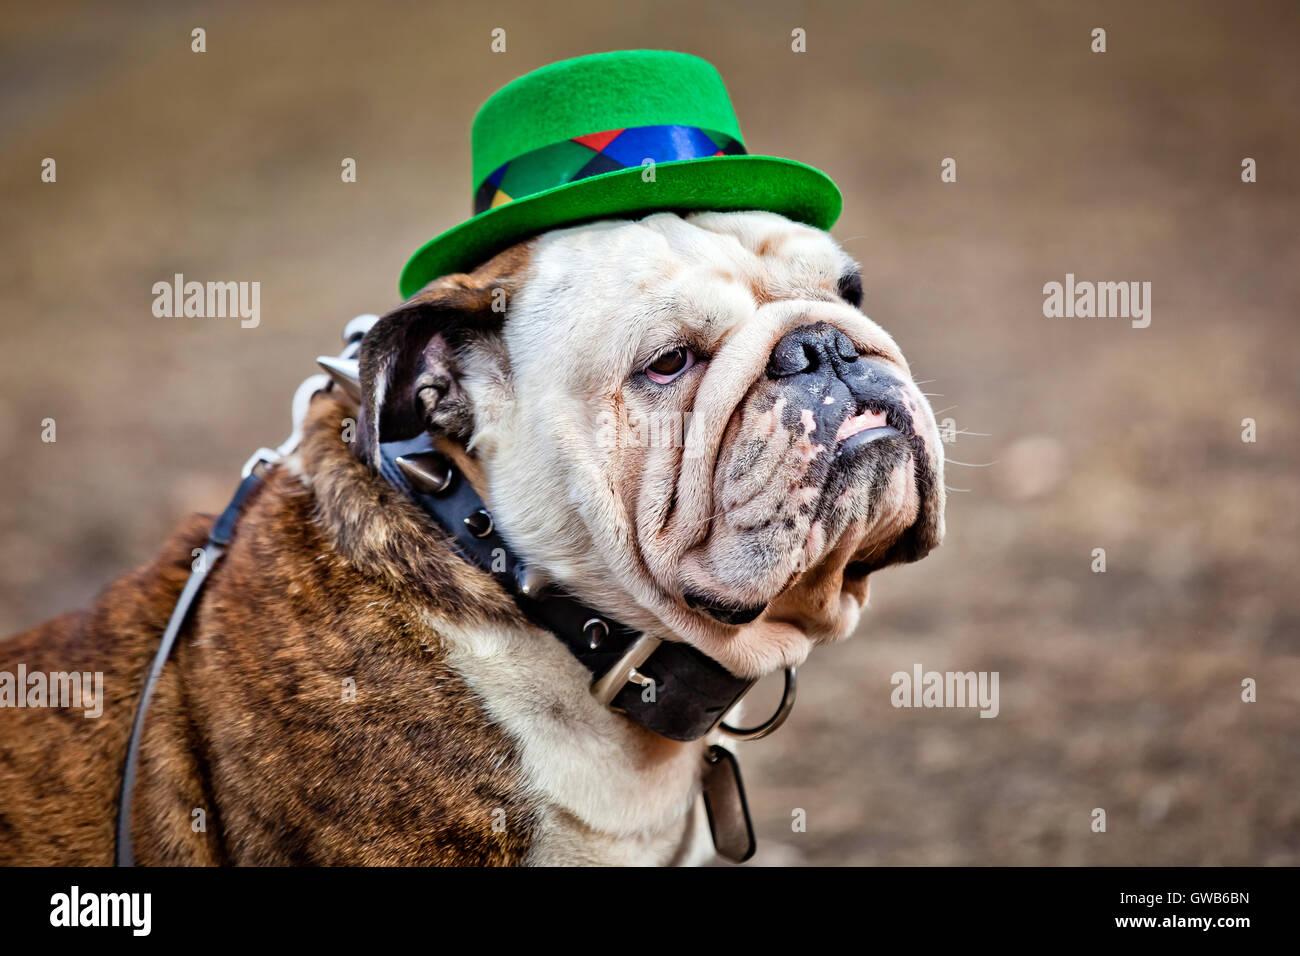 St Patrick's Day hat on English bulldog - Stock Image